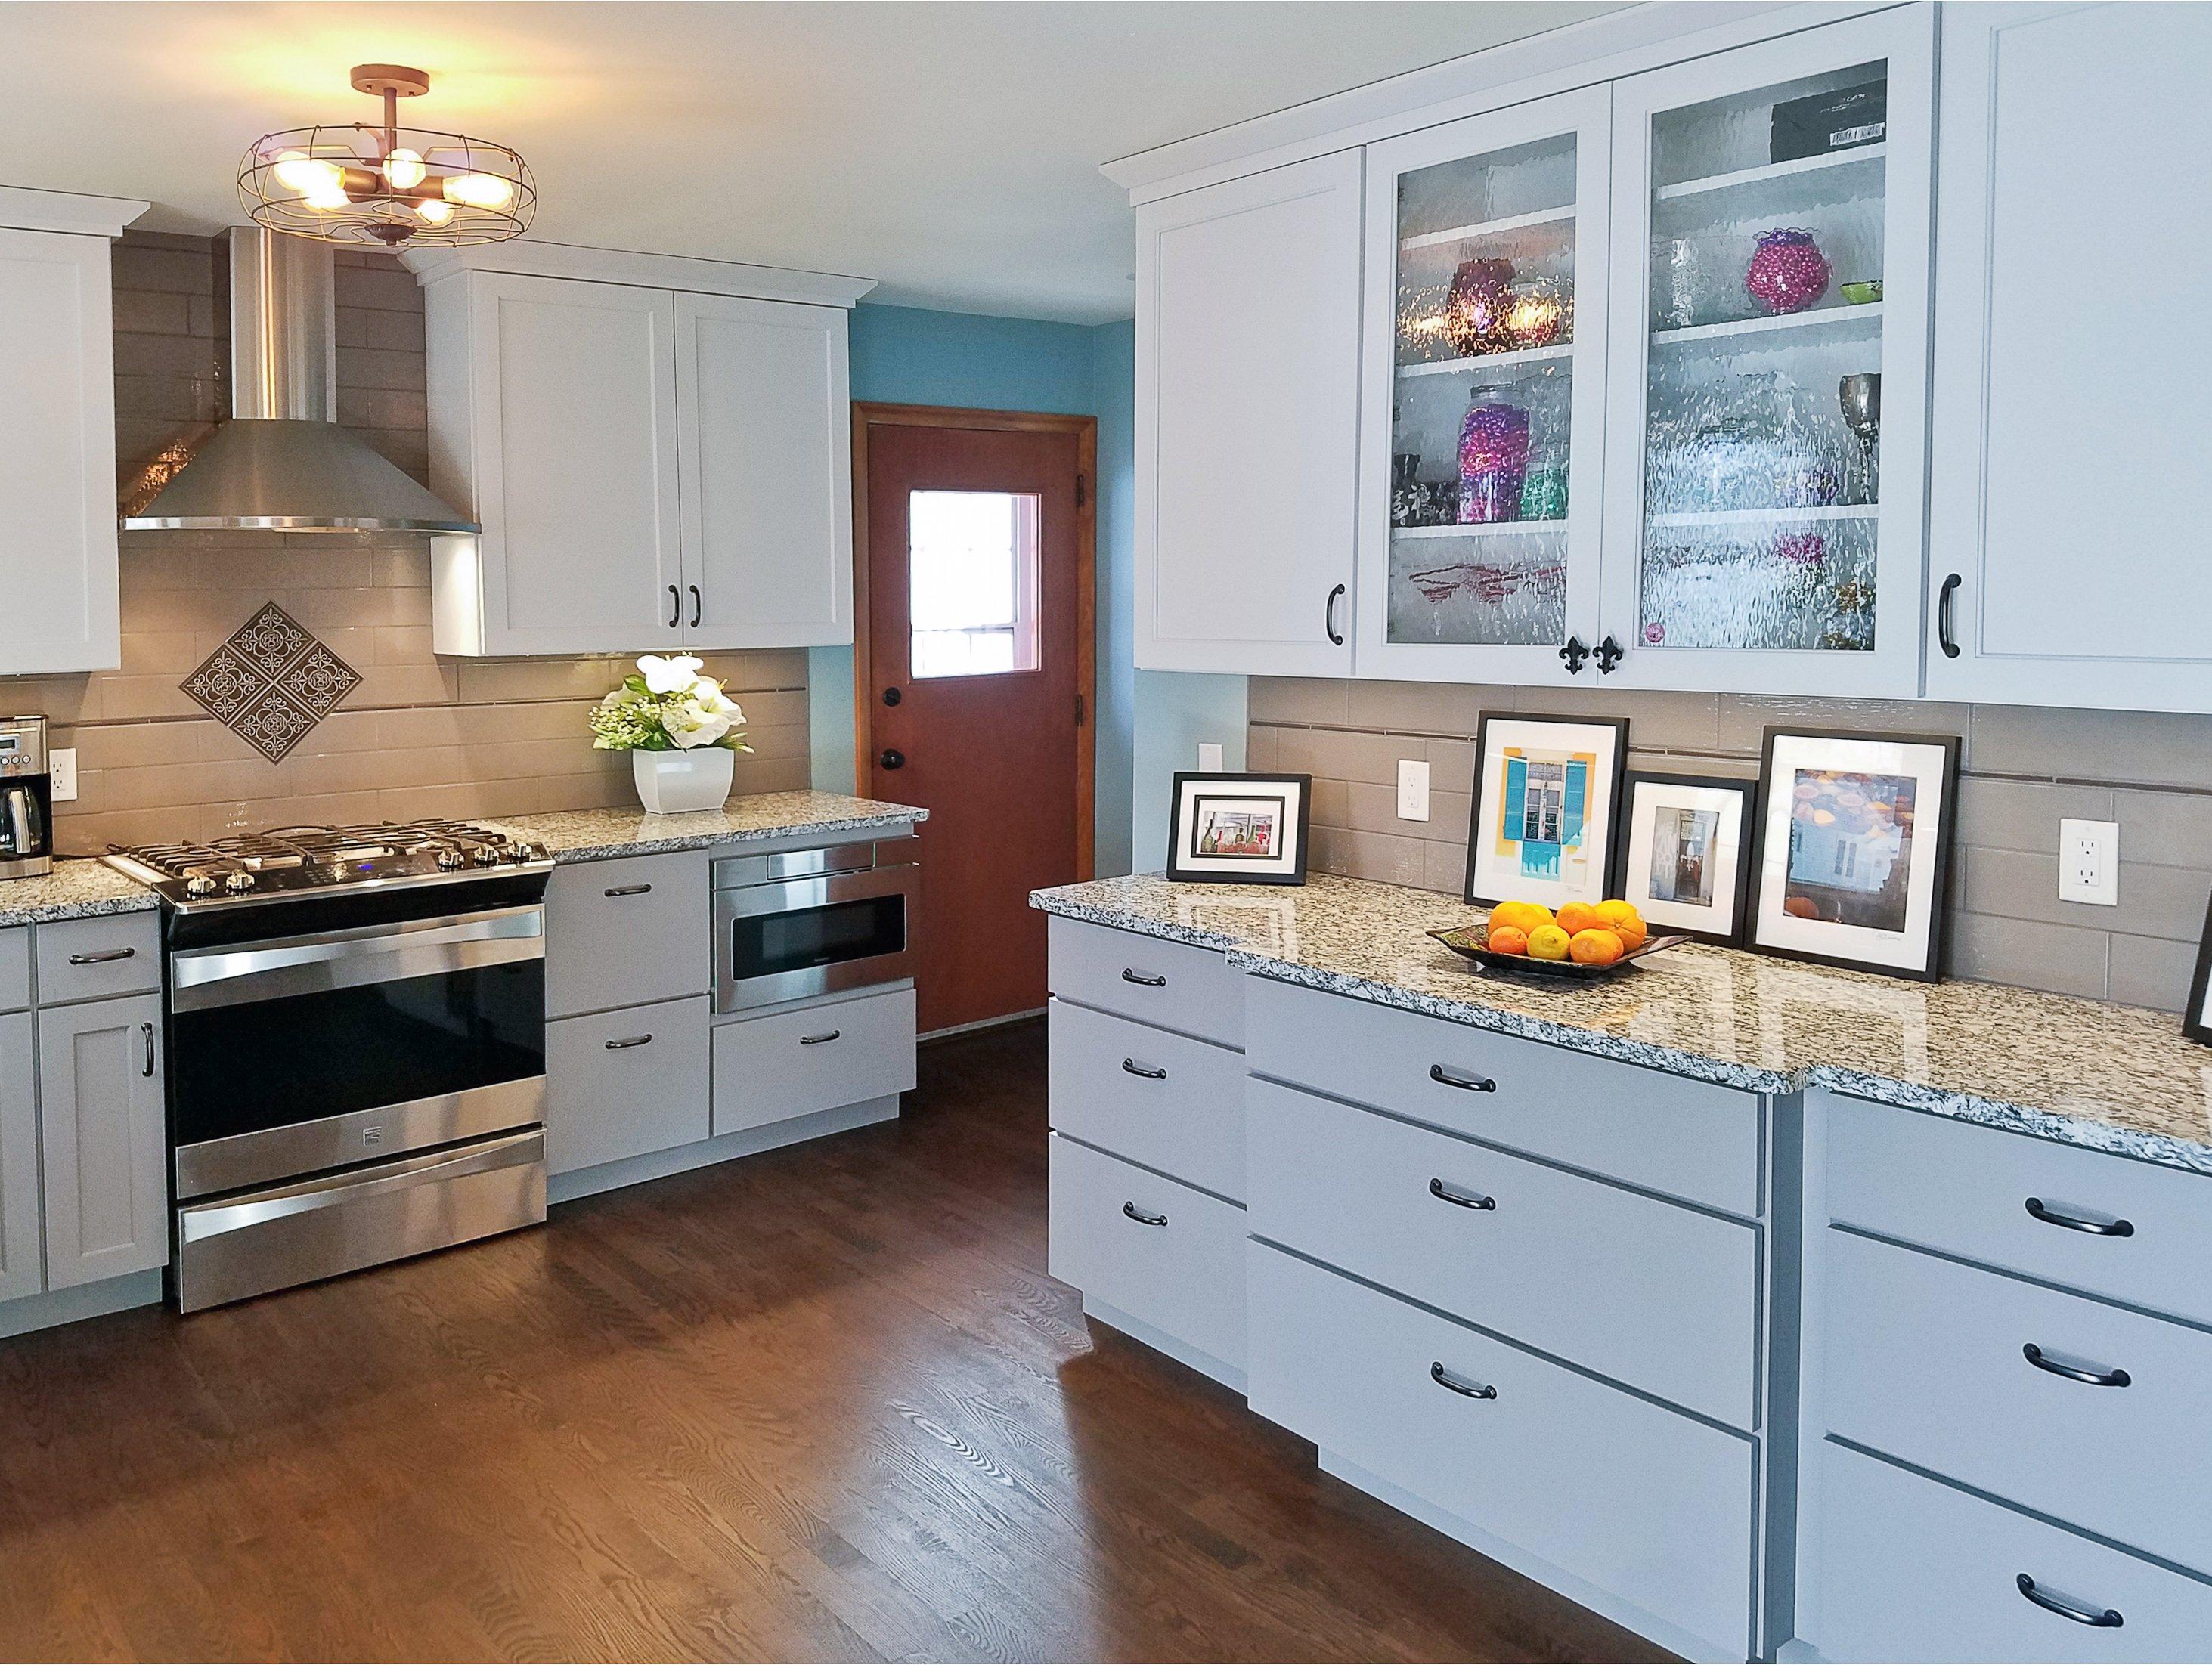 Kitchen Remodeling and Design, kitchen buffet cabinet, glass kitchen cabinets, taupe subway tile backsplash